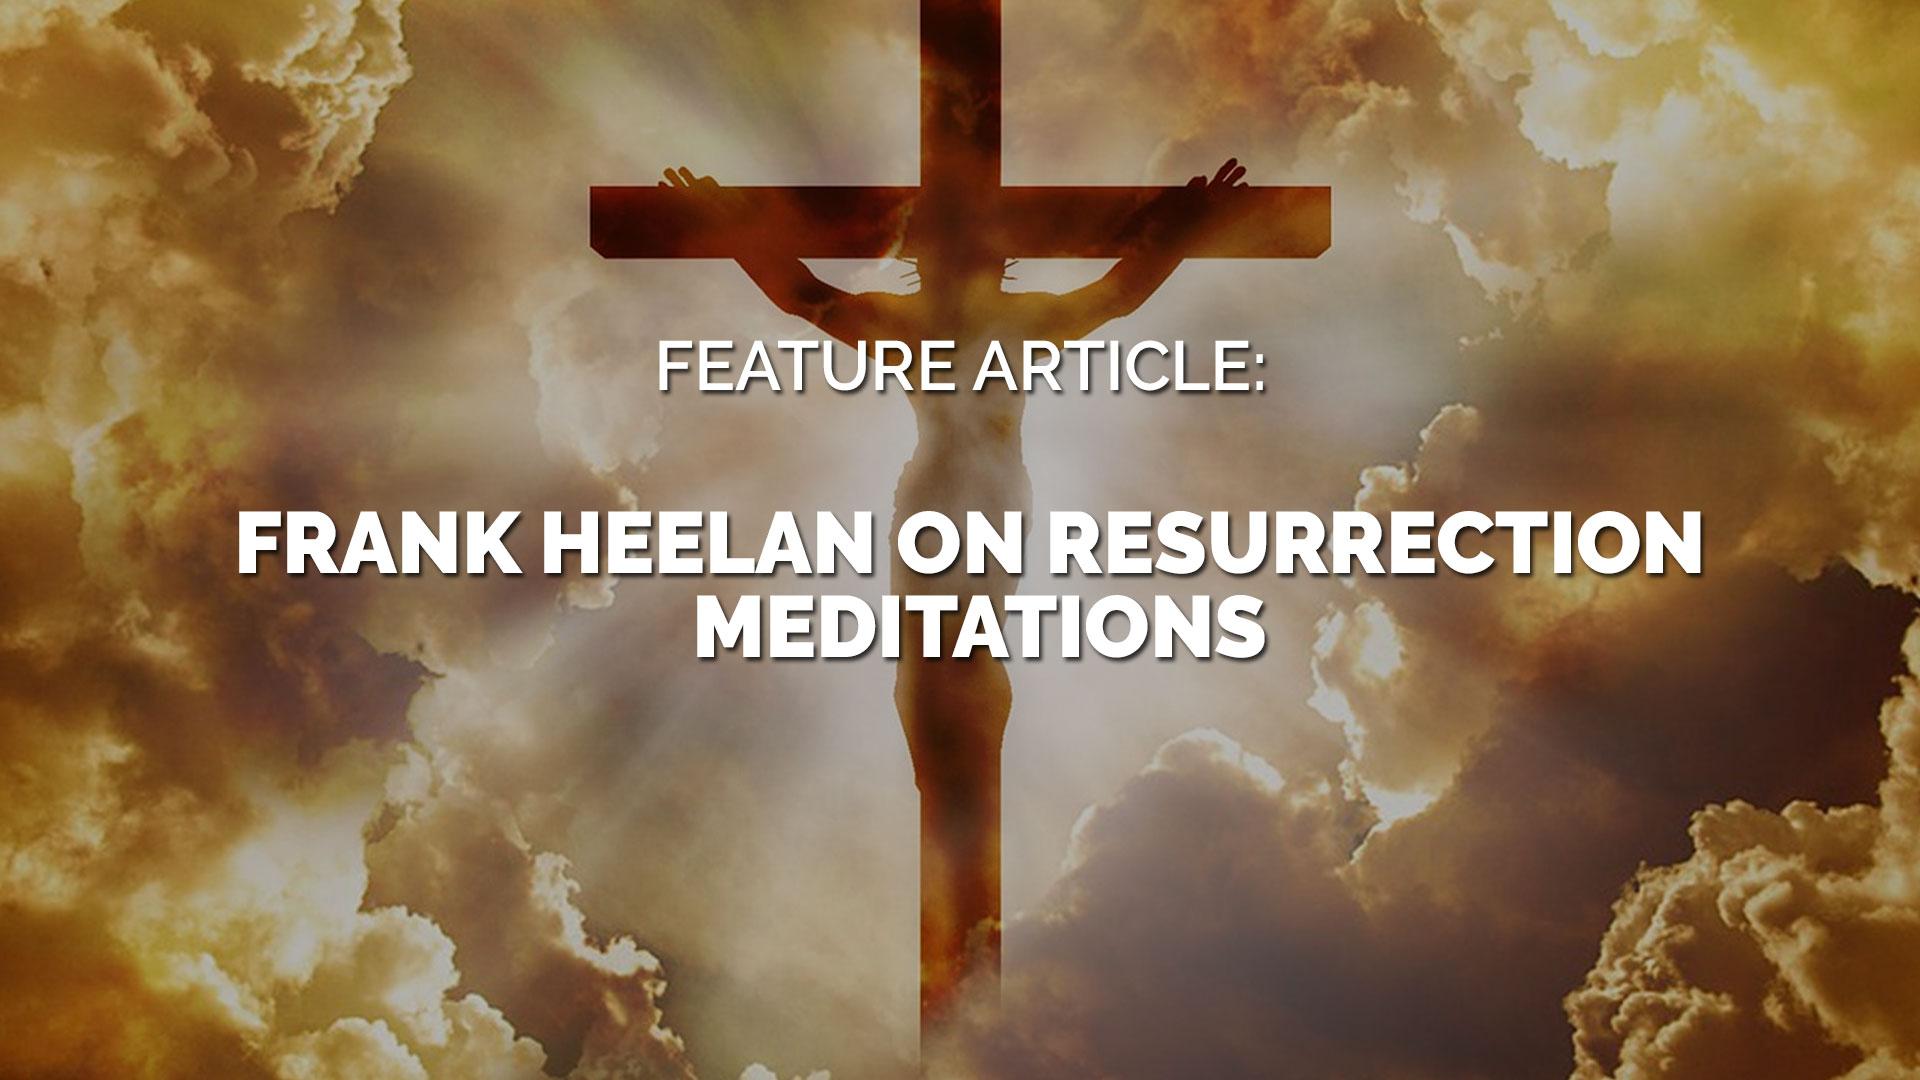 Feature-Article-Frank-Heelan-on-Resurrection-Meditation banner